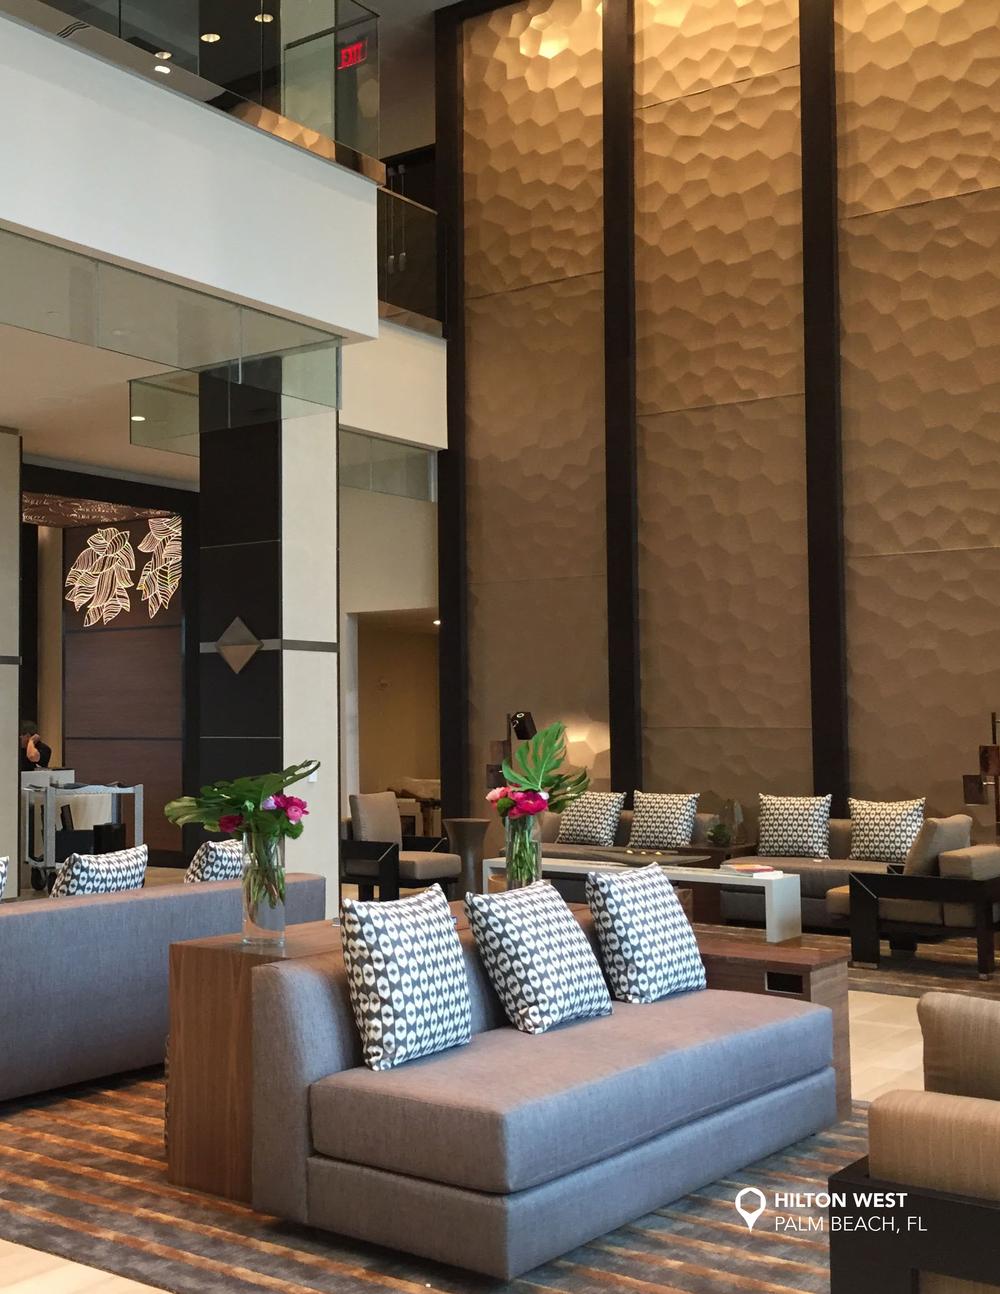 HiltonWestPalmBeach_CarvedWall1.jpg